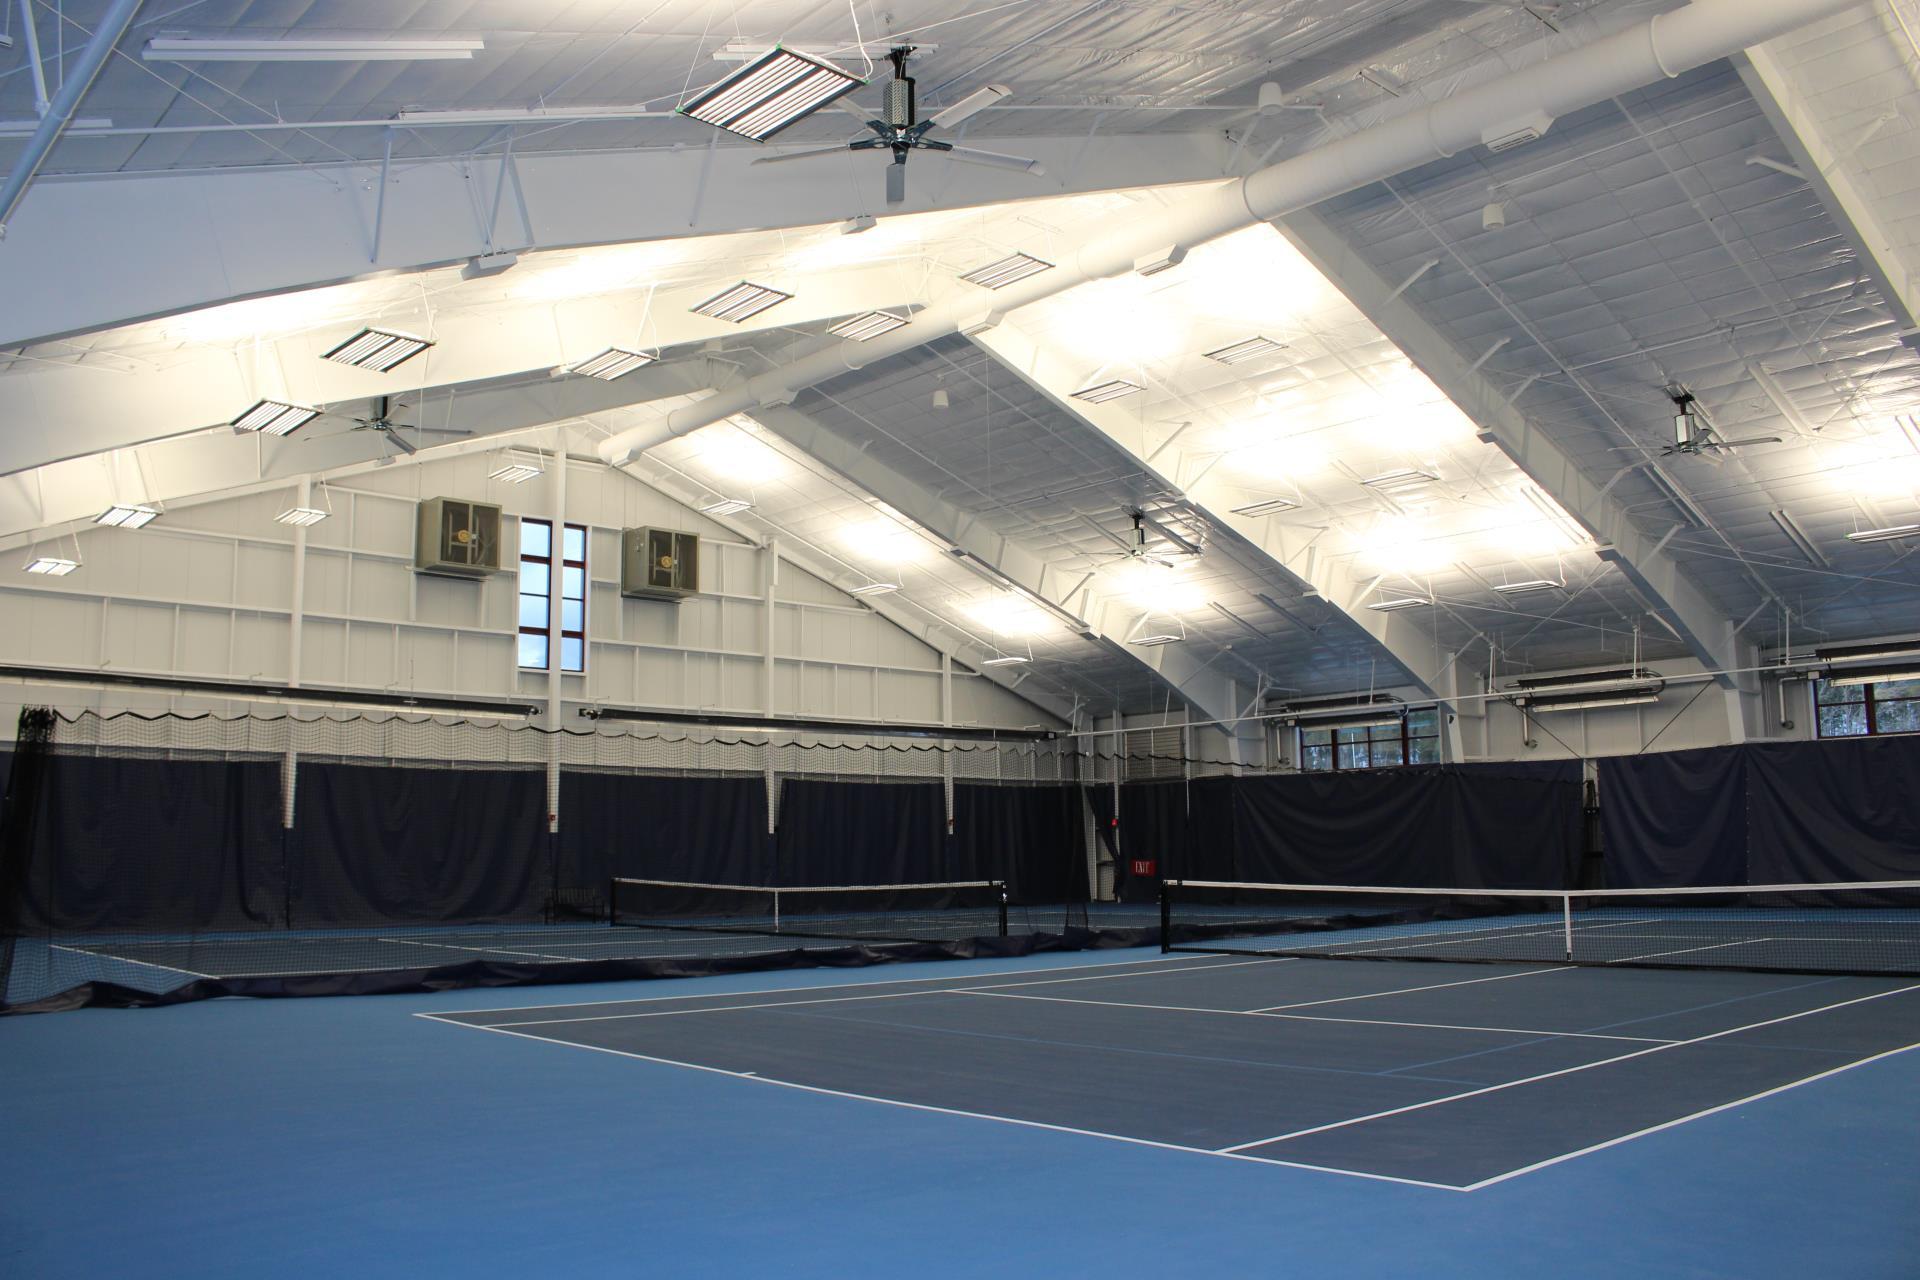 Indoor Tennis at the Rec Center